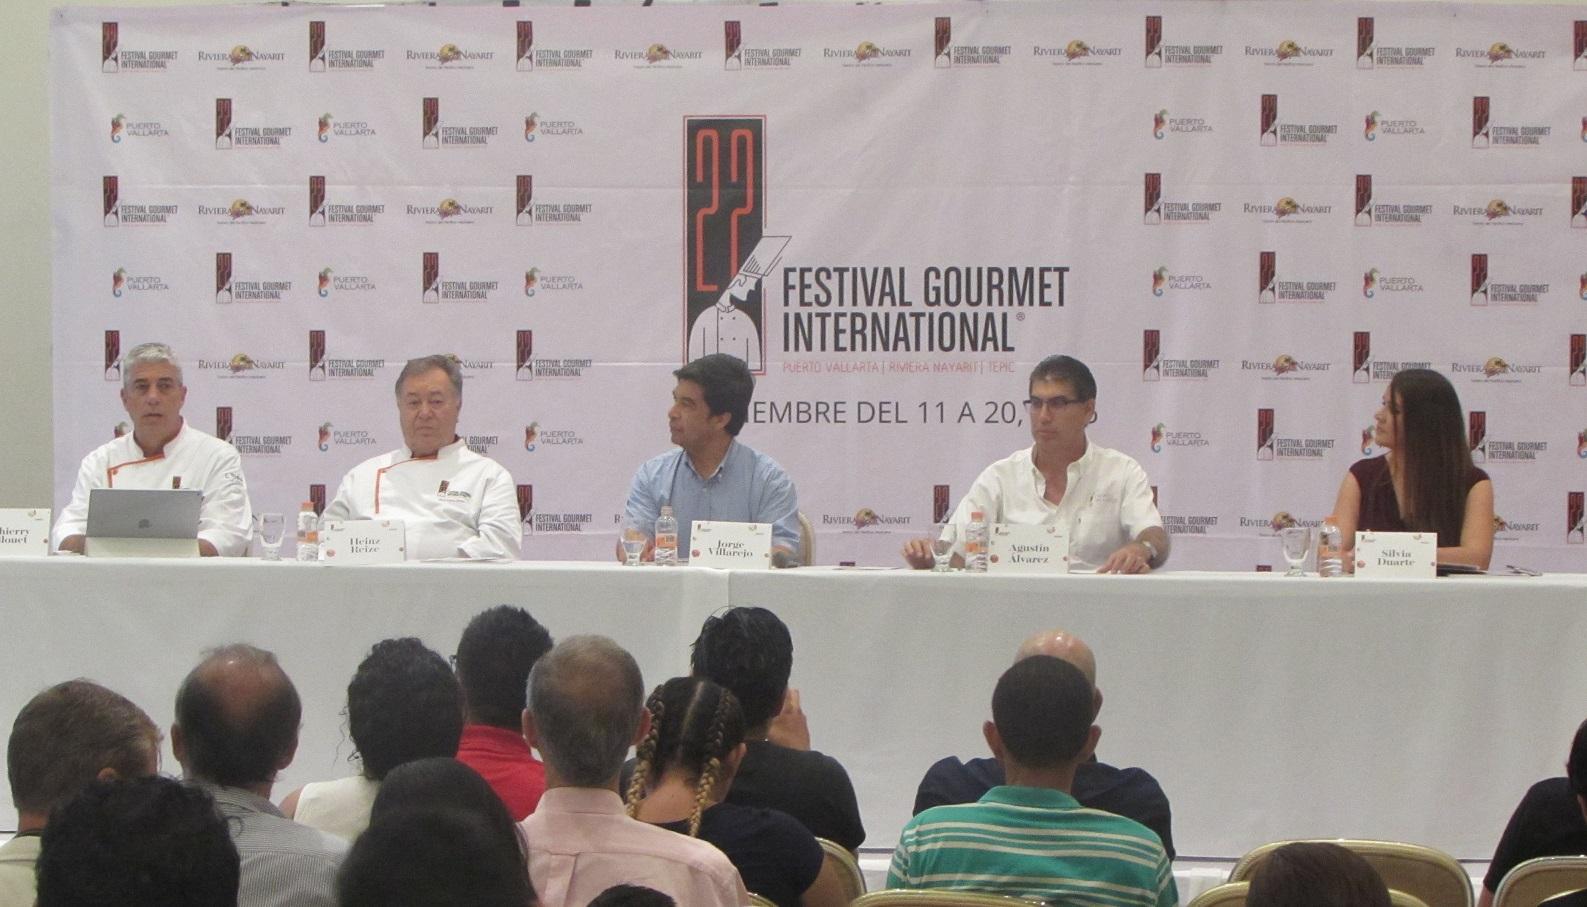 festival-gourmet-internacional